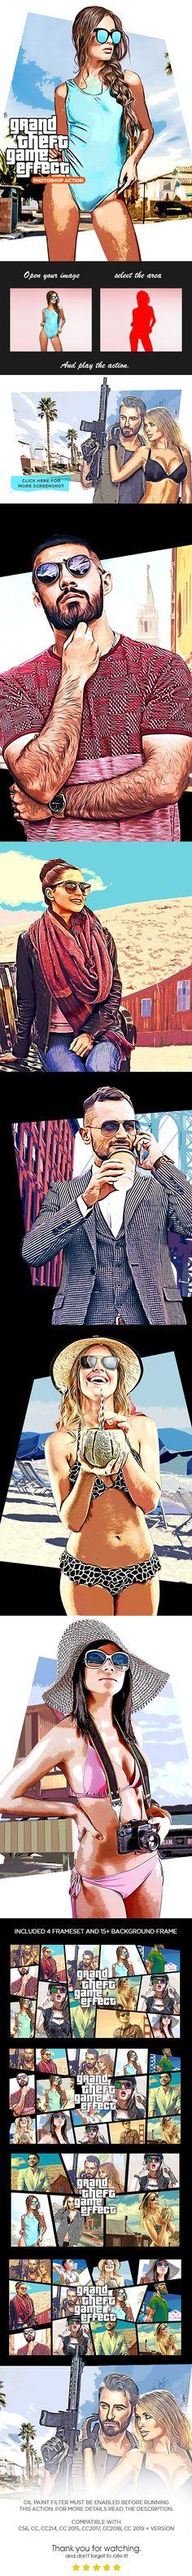 GrandTheft Game Theme Effect - Photoshop Action by haicamon .- GrandTheft Game Theme Effect – Photoshop Action by haicamon Photoshop Tutorial, Actions Photoshop, Effects Photoshop, Cool Photoshop, Lightroom, Photoshop Website, Photoshop Photography, Art Photography, Photography Articles